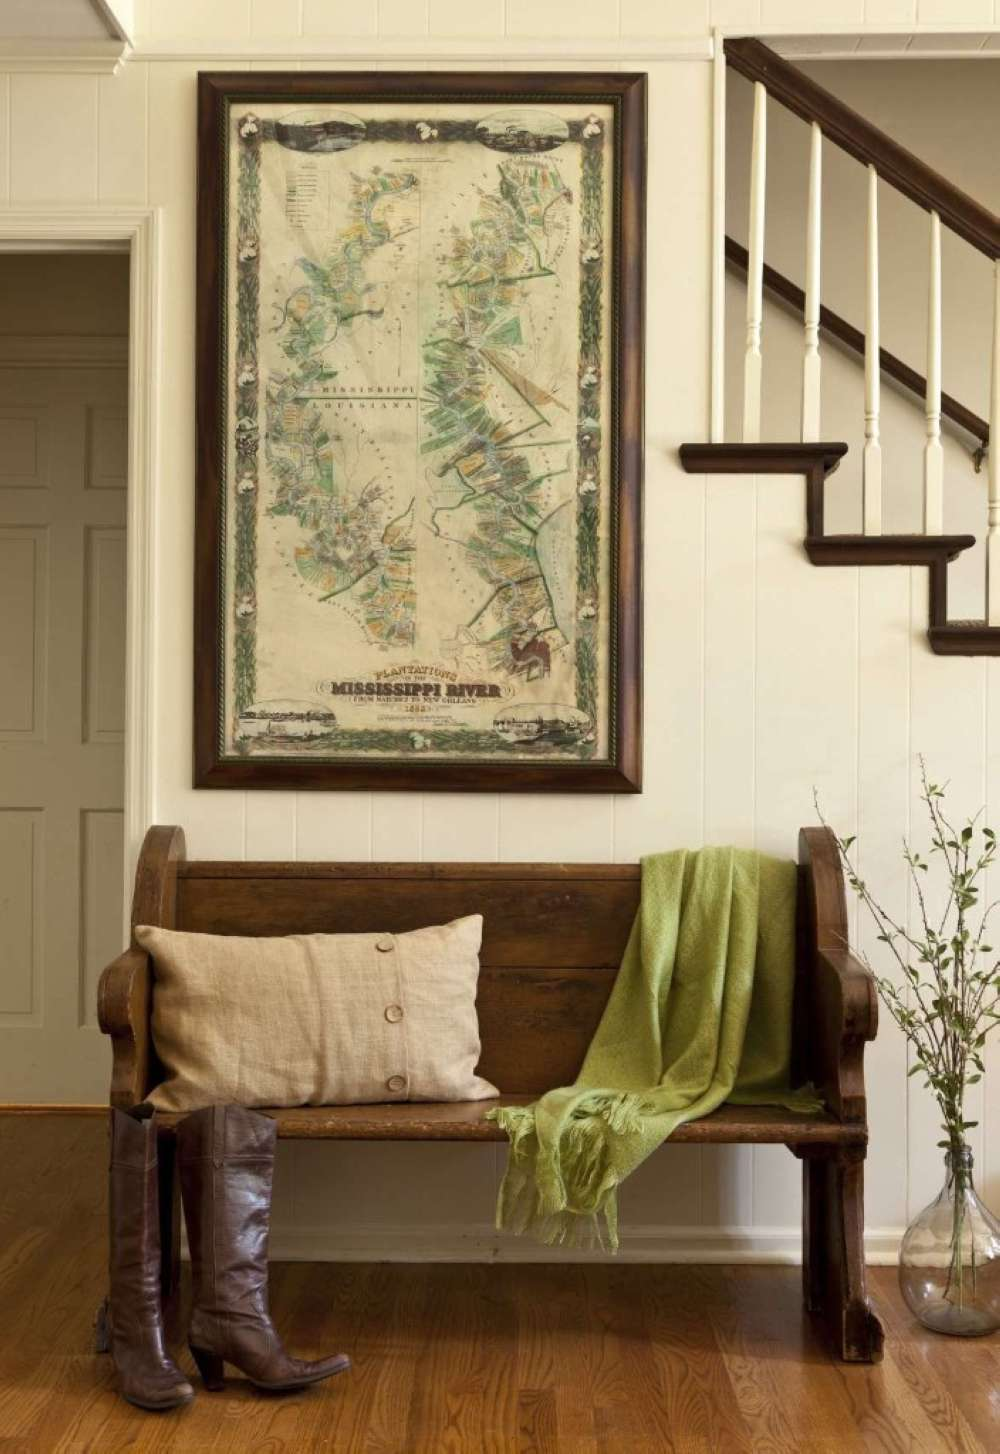 Rustic-Family-Residence-Little-rock-arkansas-by-K-Lewis-Interior-Design_003